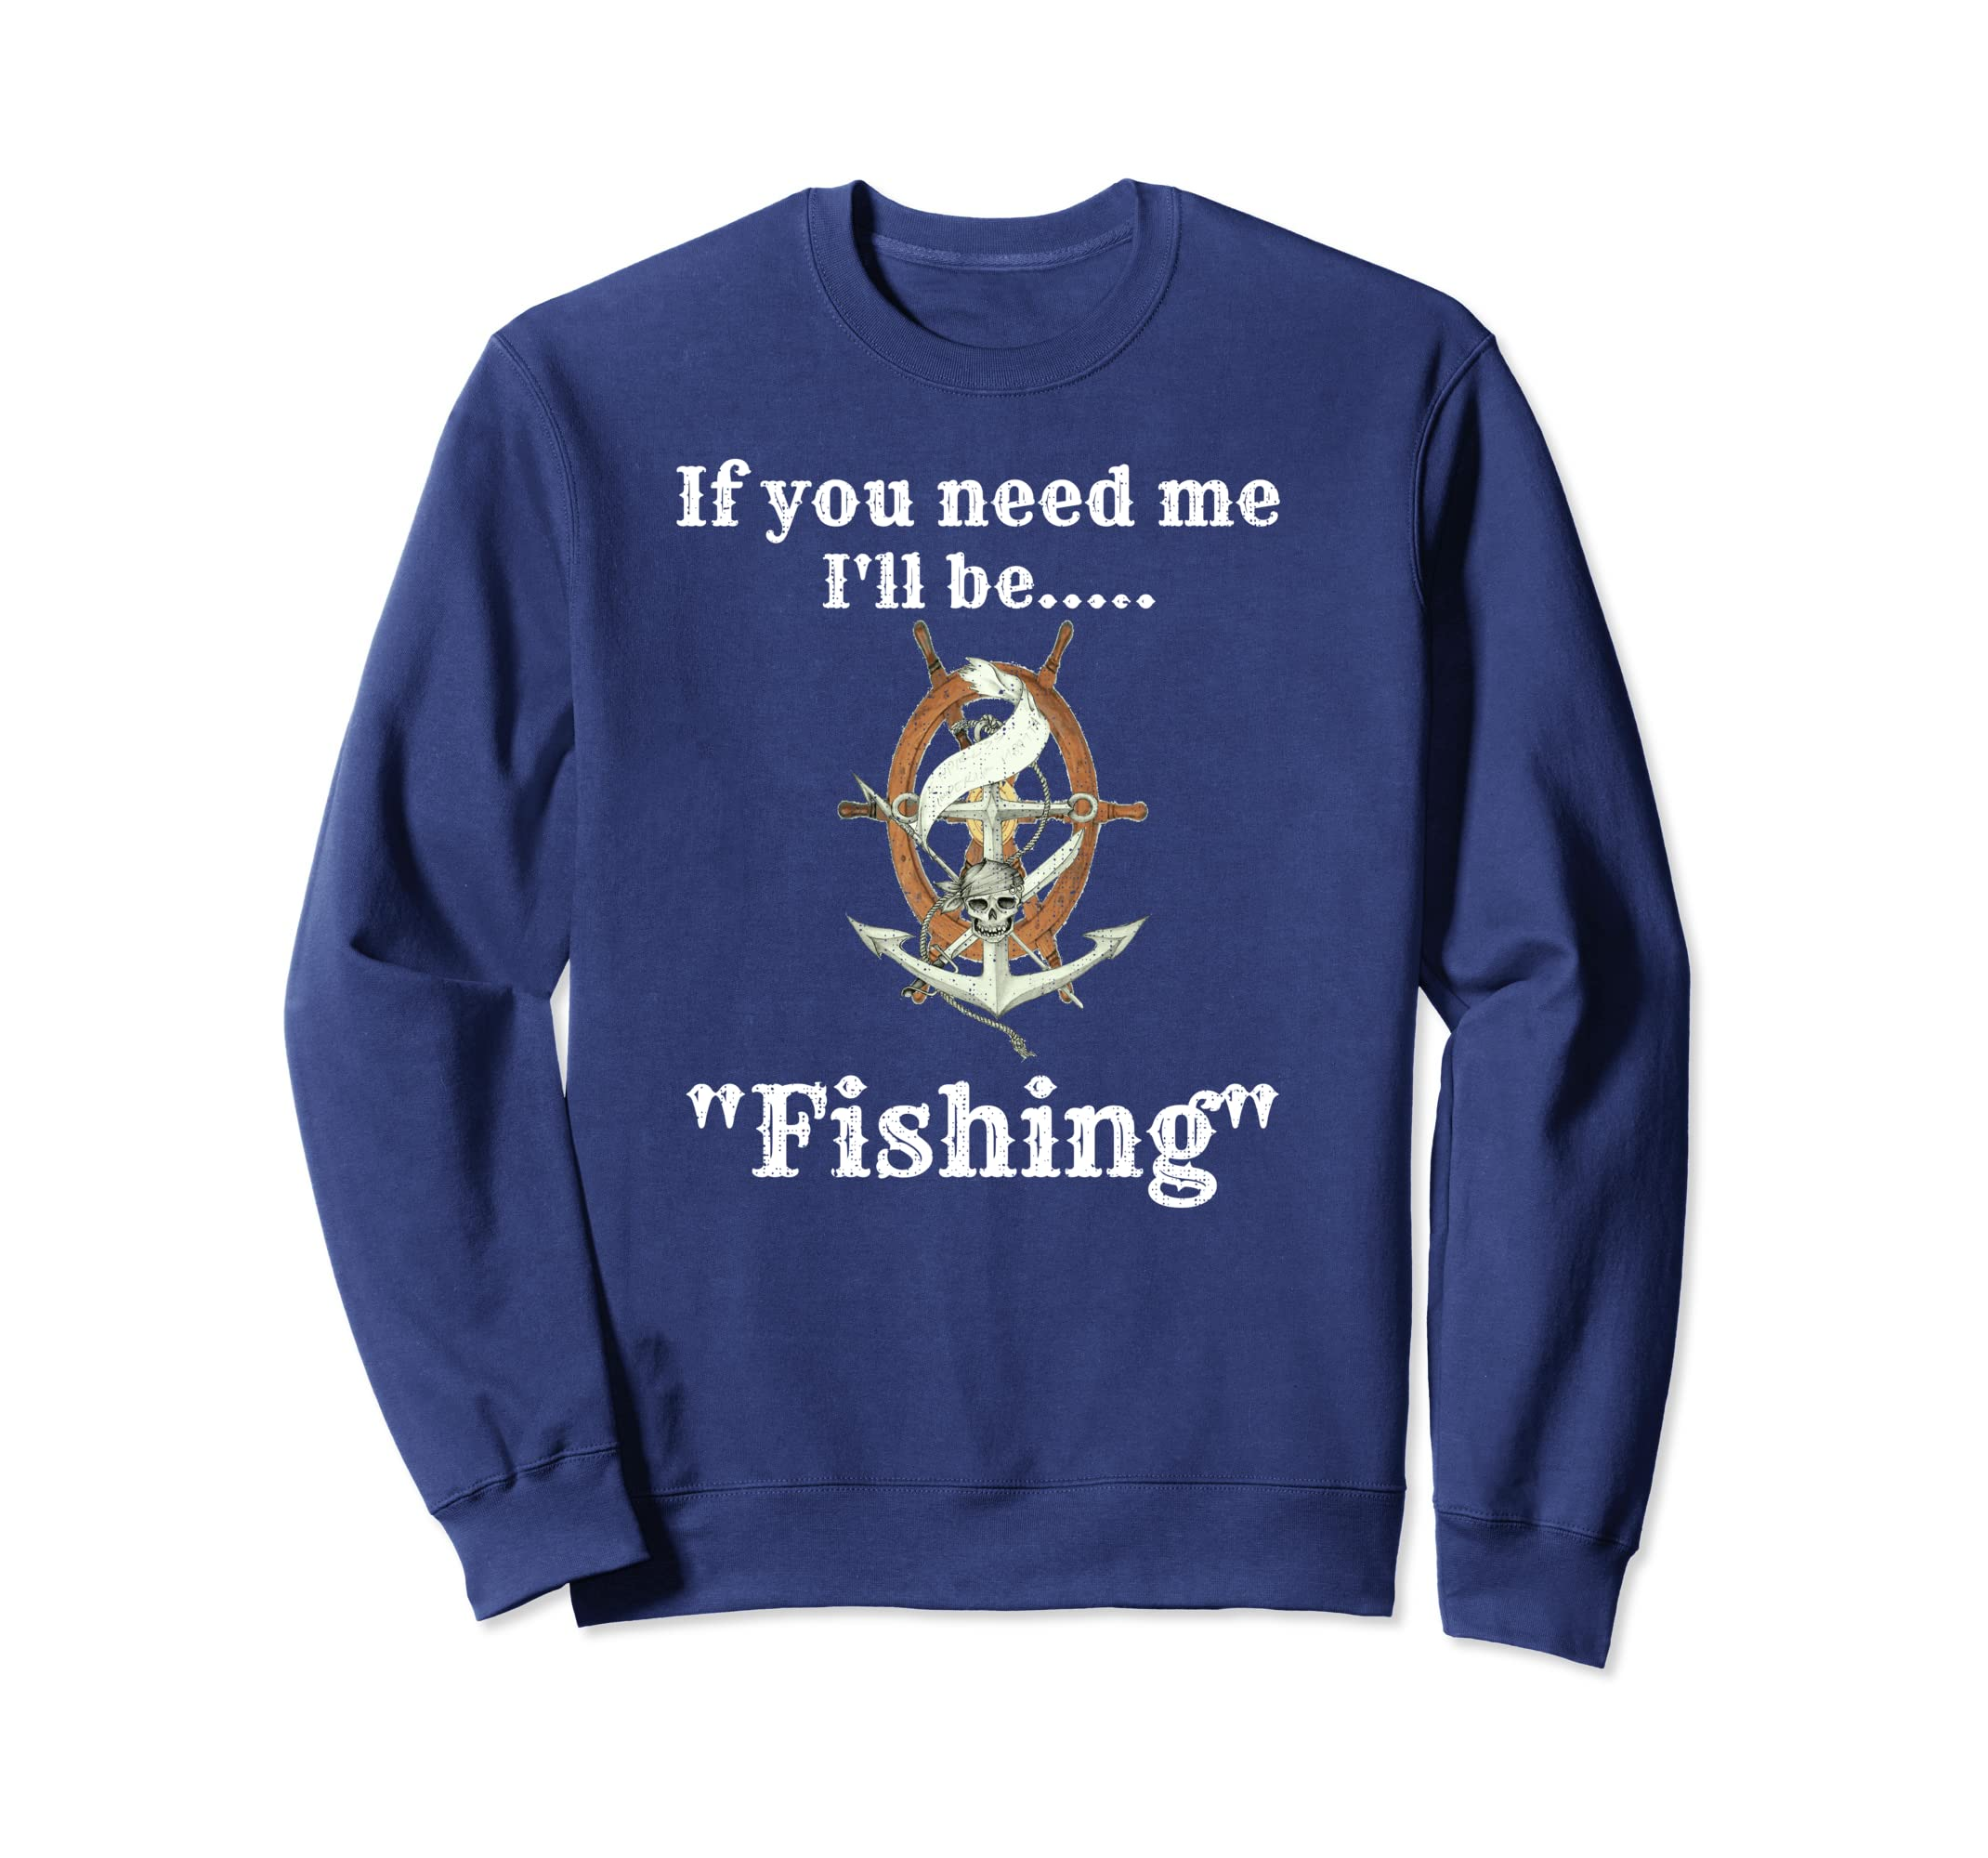 Amazoncom Fishing Sweatshirt Men Women Graphic Funny Fishing